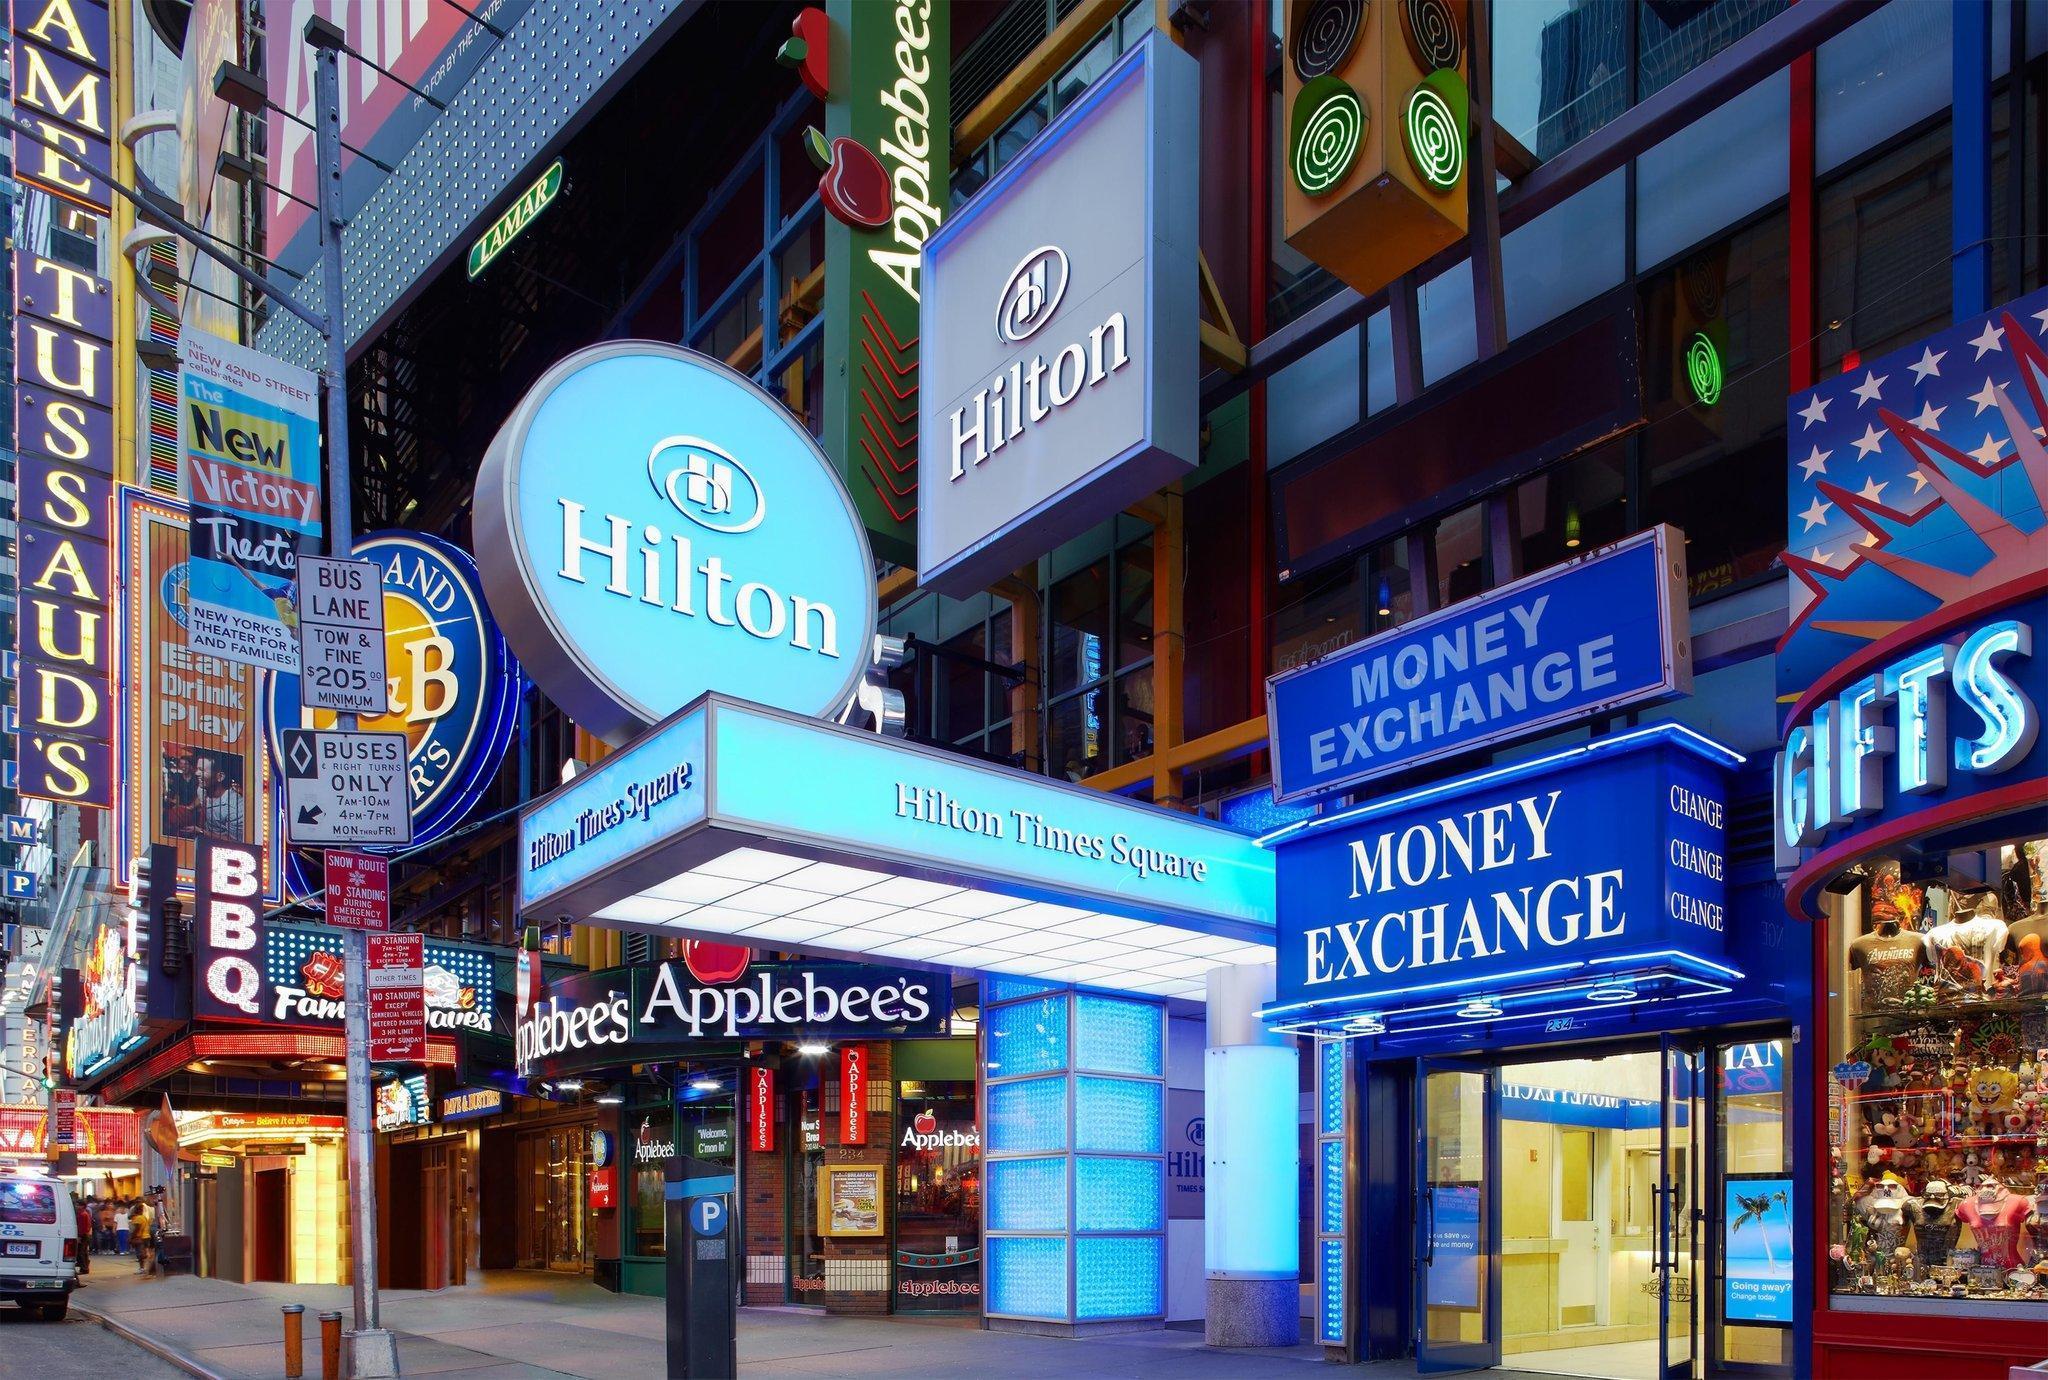 Hilton Times Square Hotel image